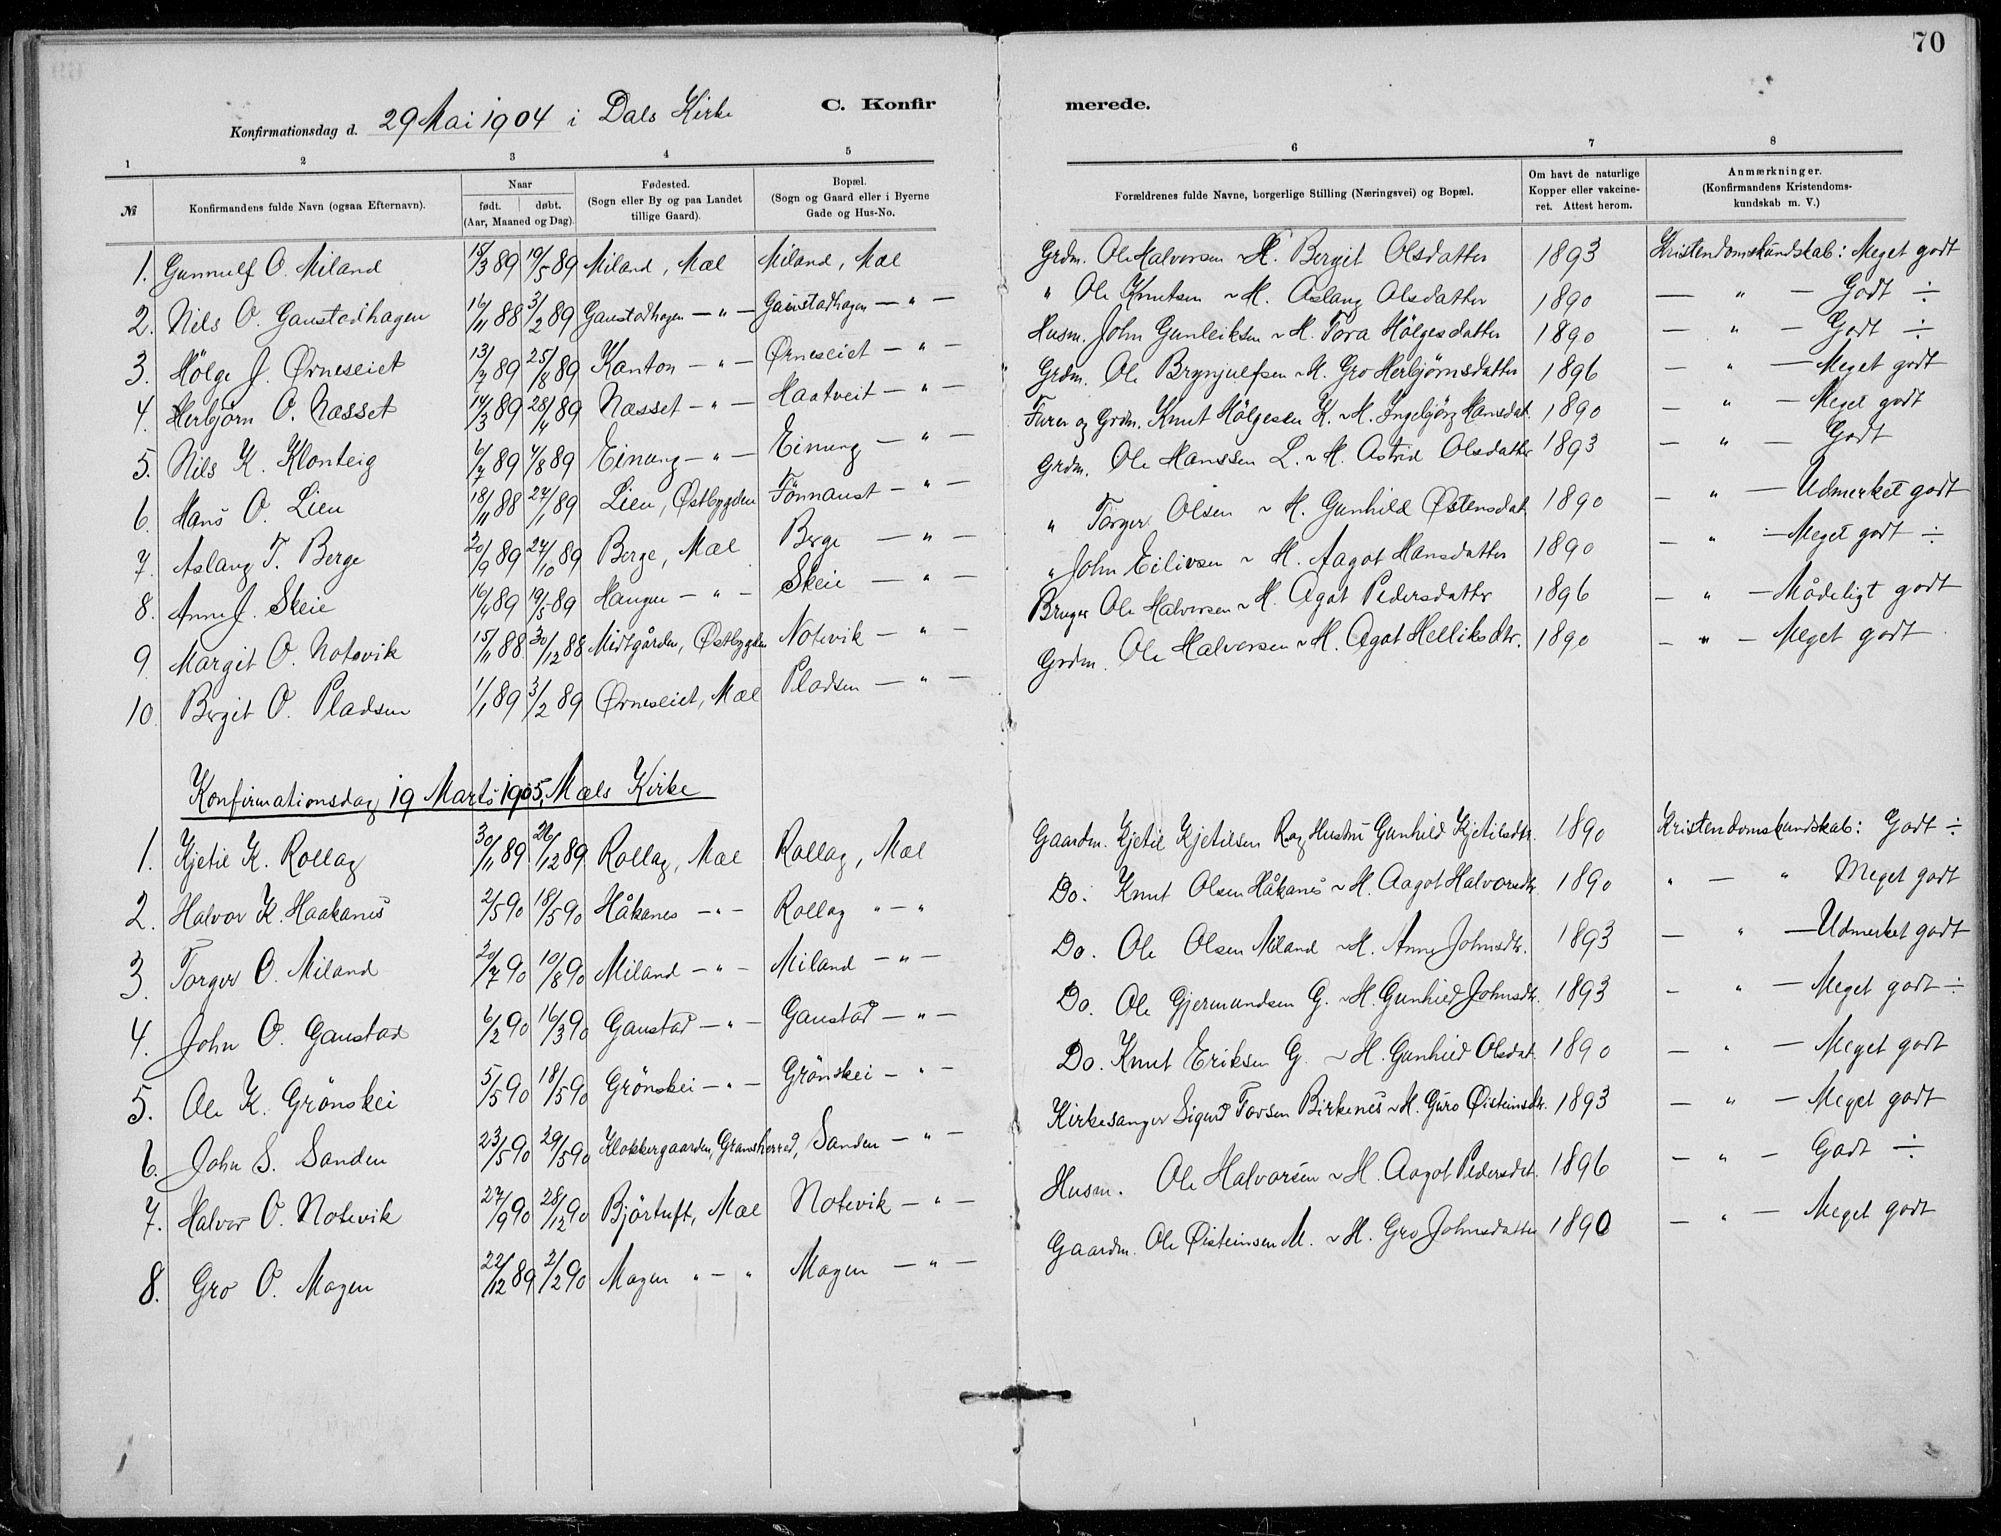 SAKO, Tinn kirkebøker, F/Fb/L0002: Ministerialbok nr. II 2, 1878-1917, s. 70